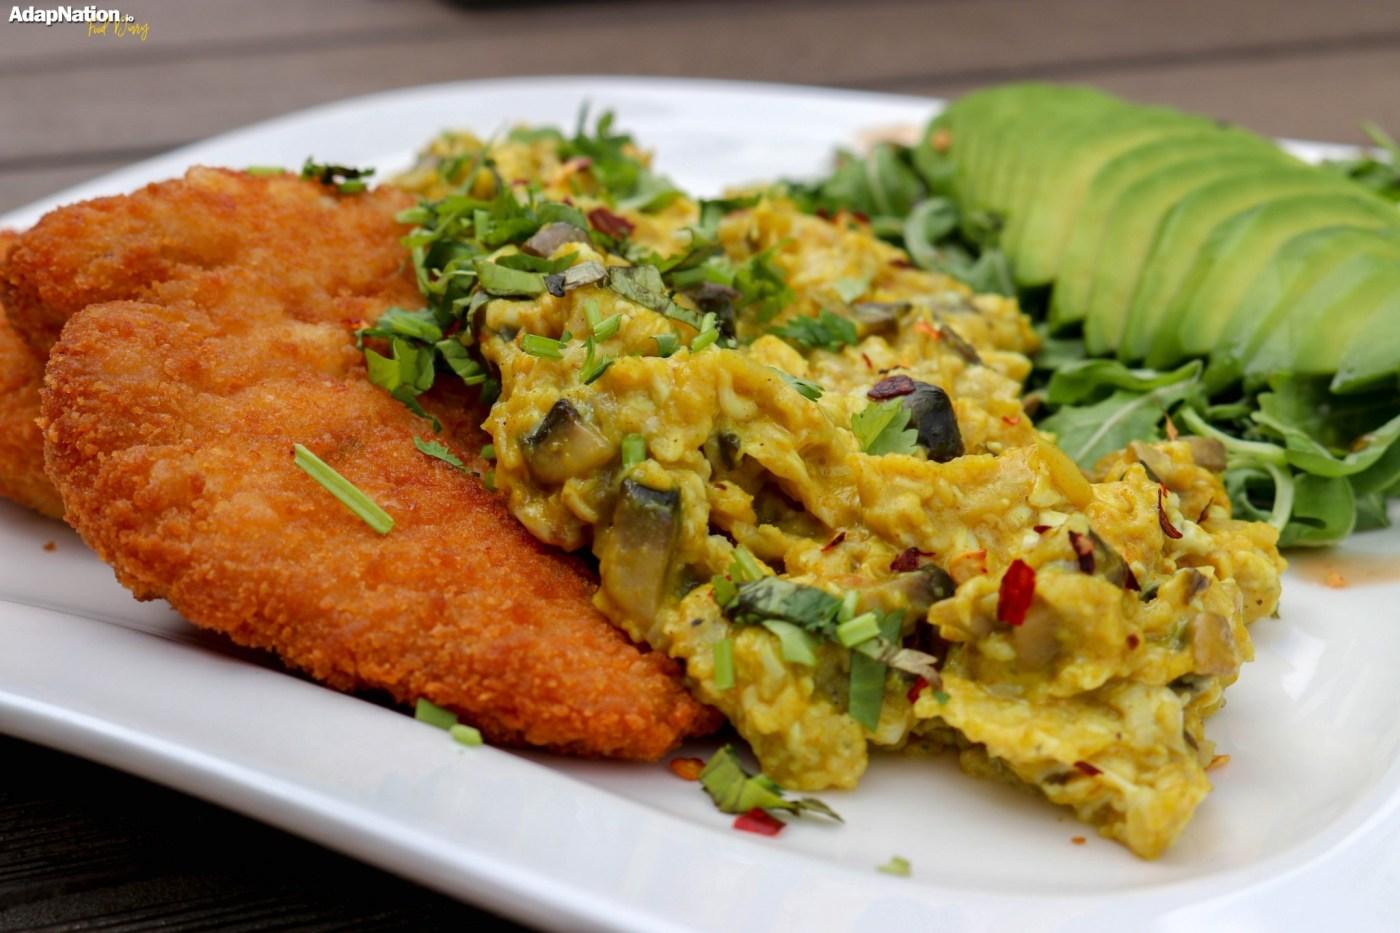 Eggs-A-La-Michelle, with Chicken Schnitzel, Avo and Rocket Salad